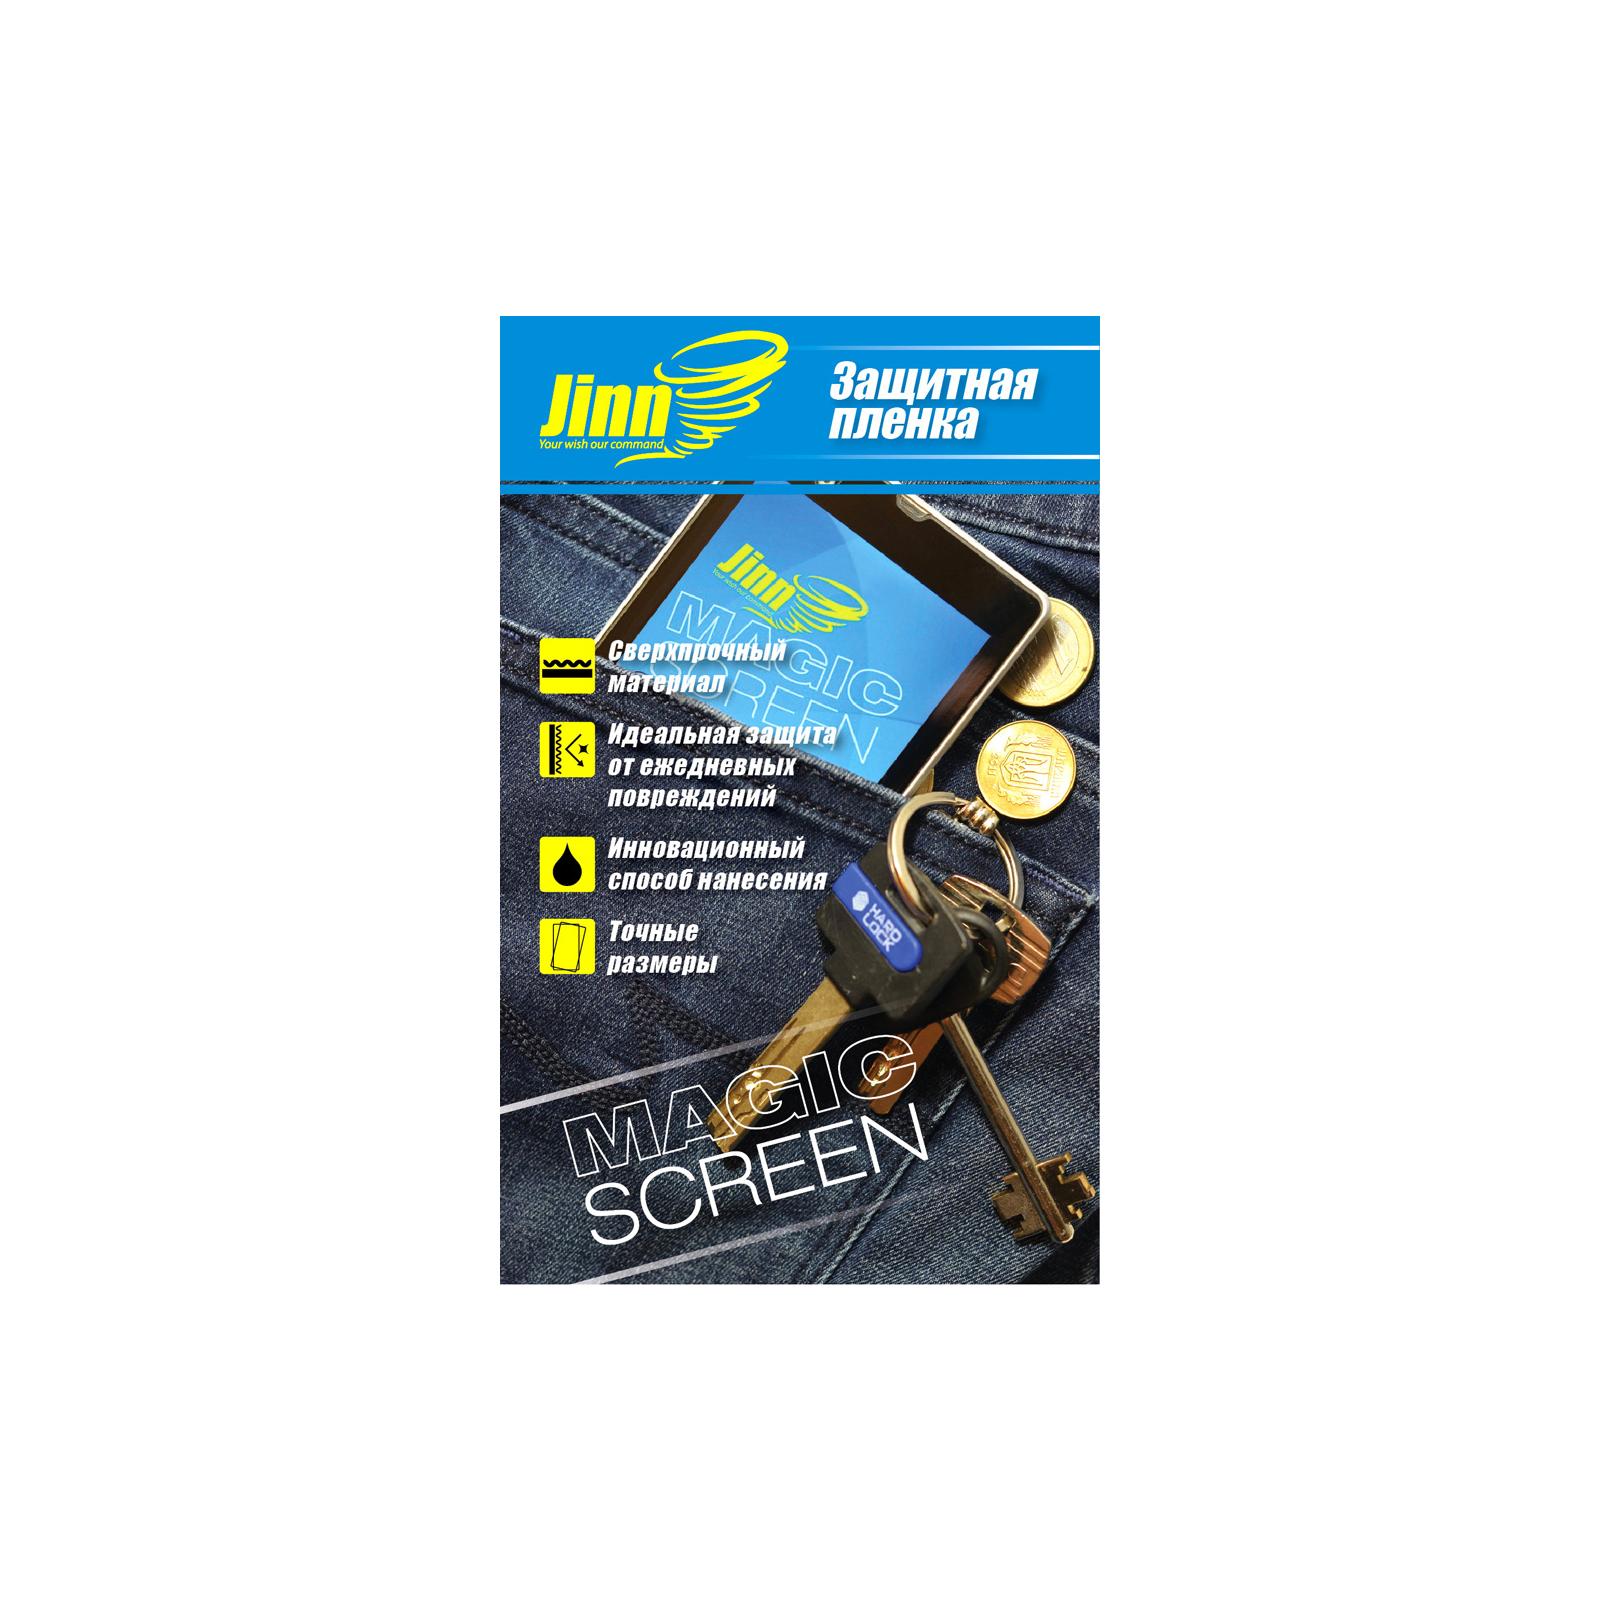 Пленка защитная JINN ультрапрочная Magic Screen для Acer Liquid Gallant E350 (Acer Liquid Gallant front)